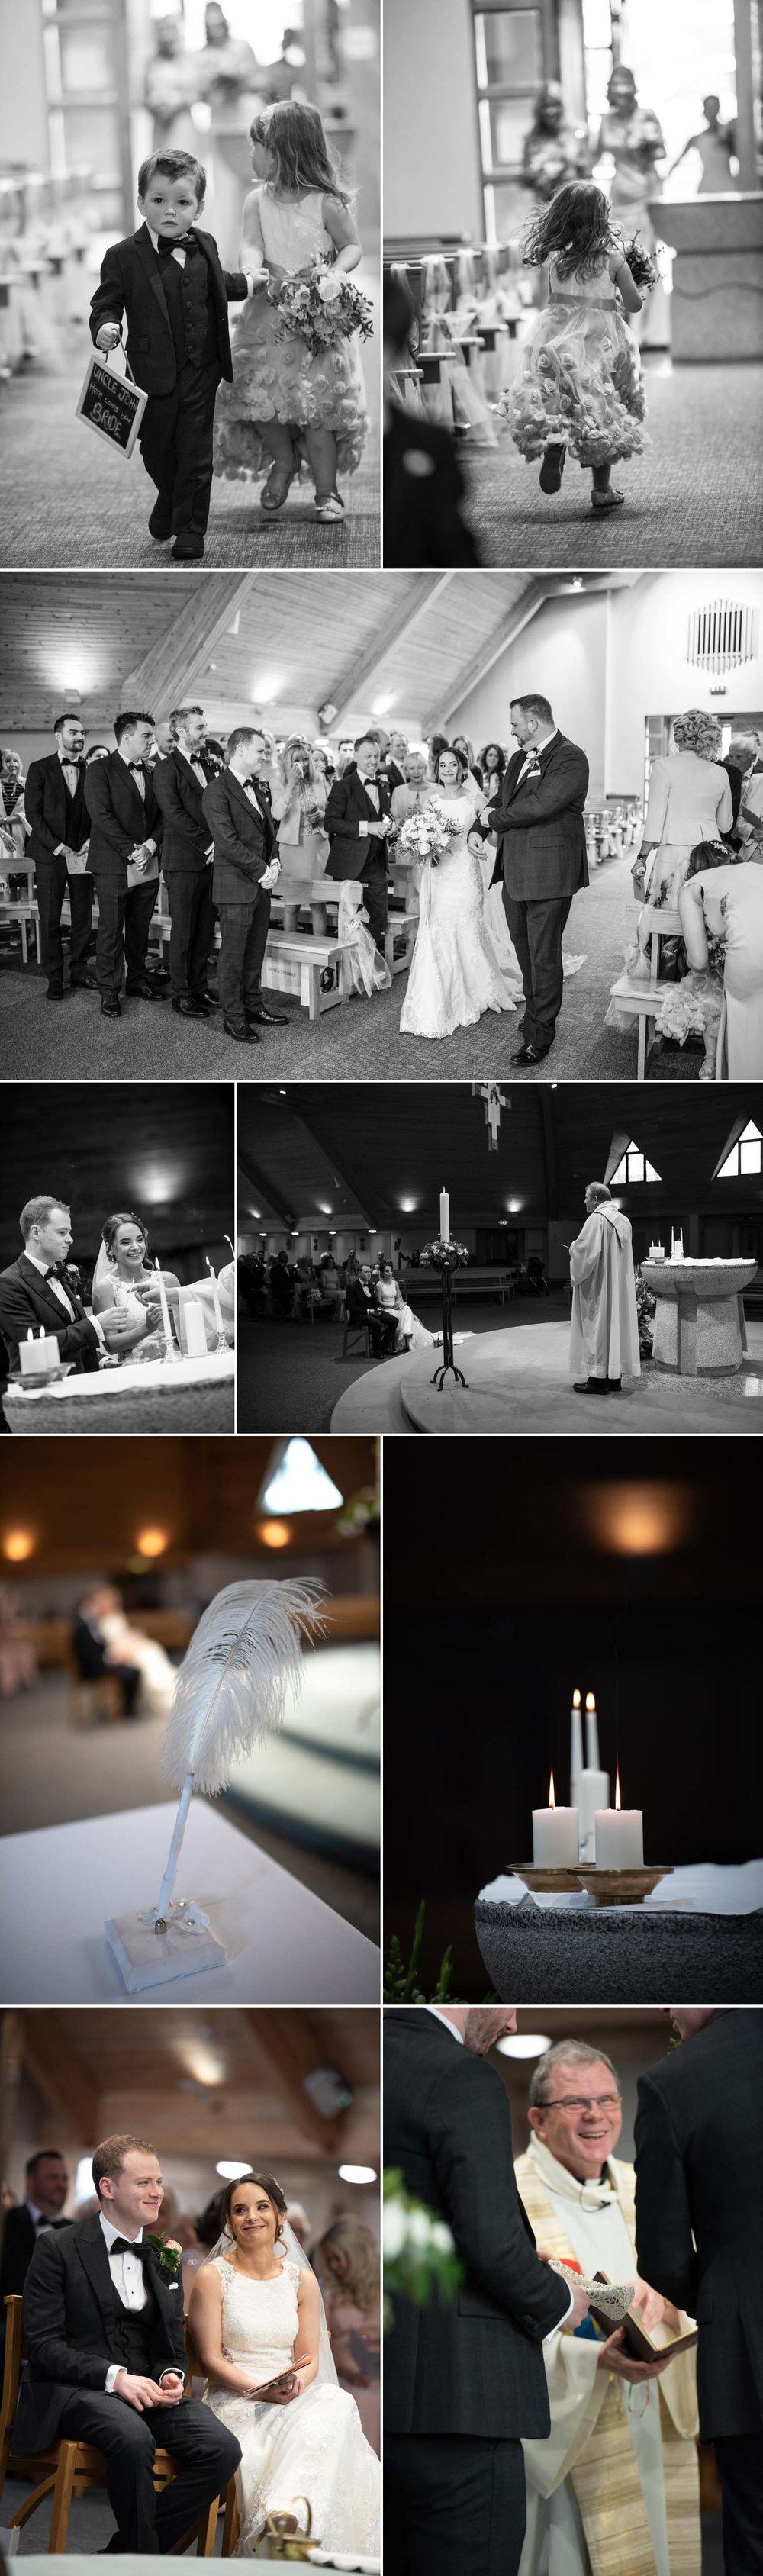 Merchant Hotel Belfast Wedding Photography James McGrillis 09.jpg